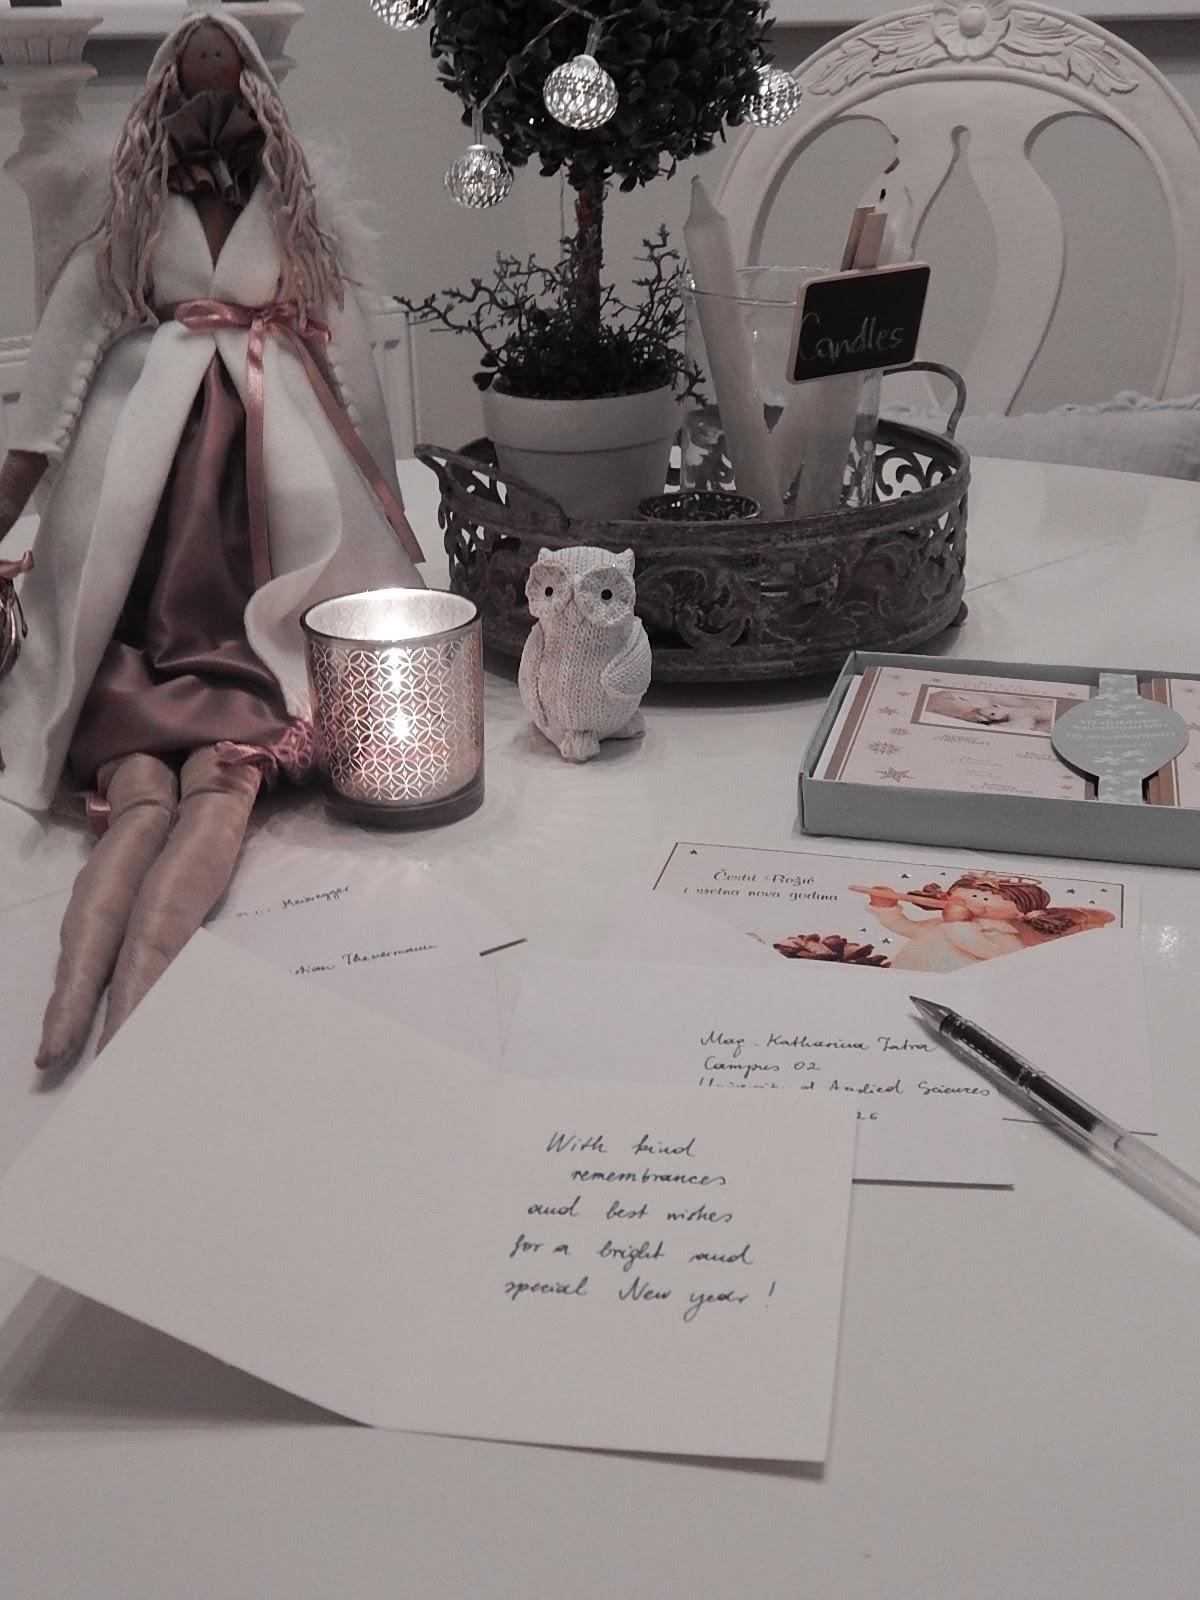 pisane božićne čestitke Božićne čestitke   My charming house No 6 pisane božićne čestitke